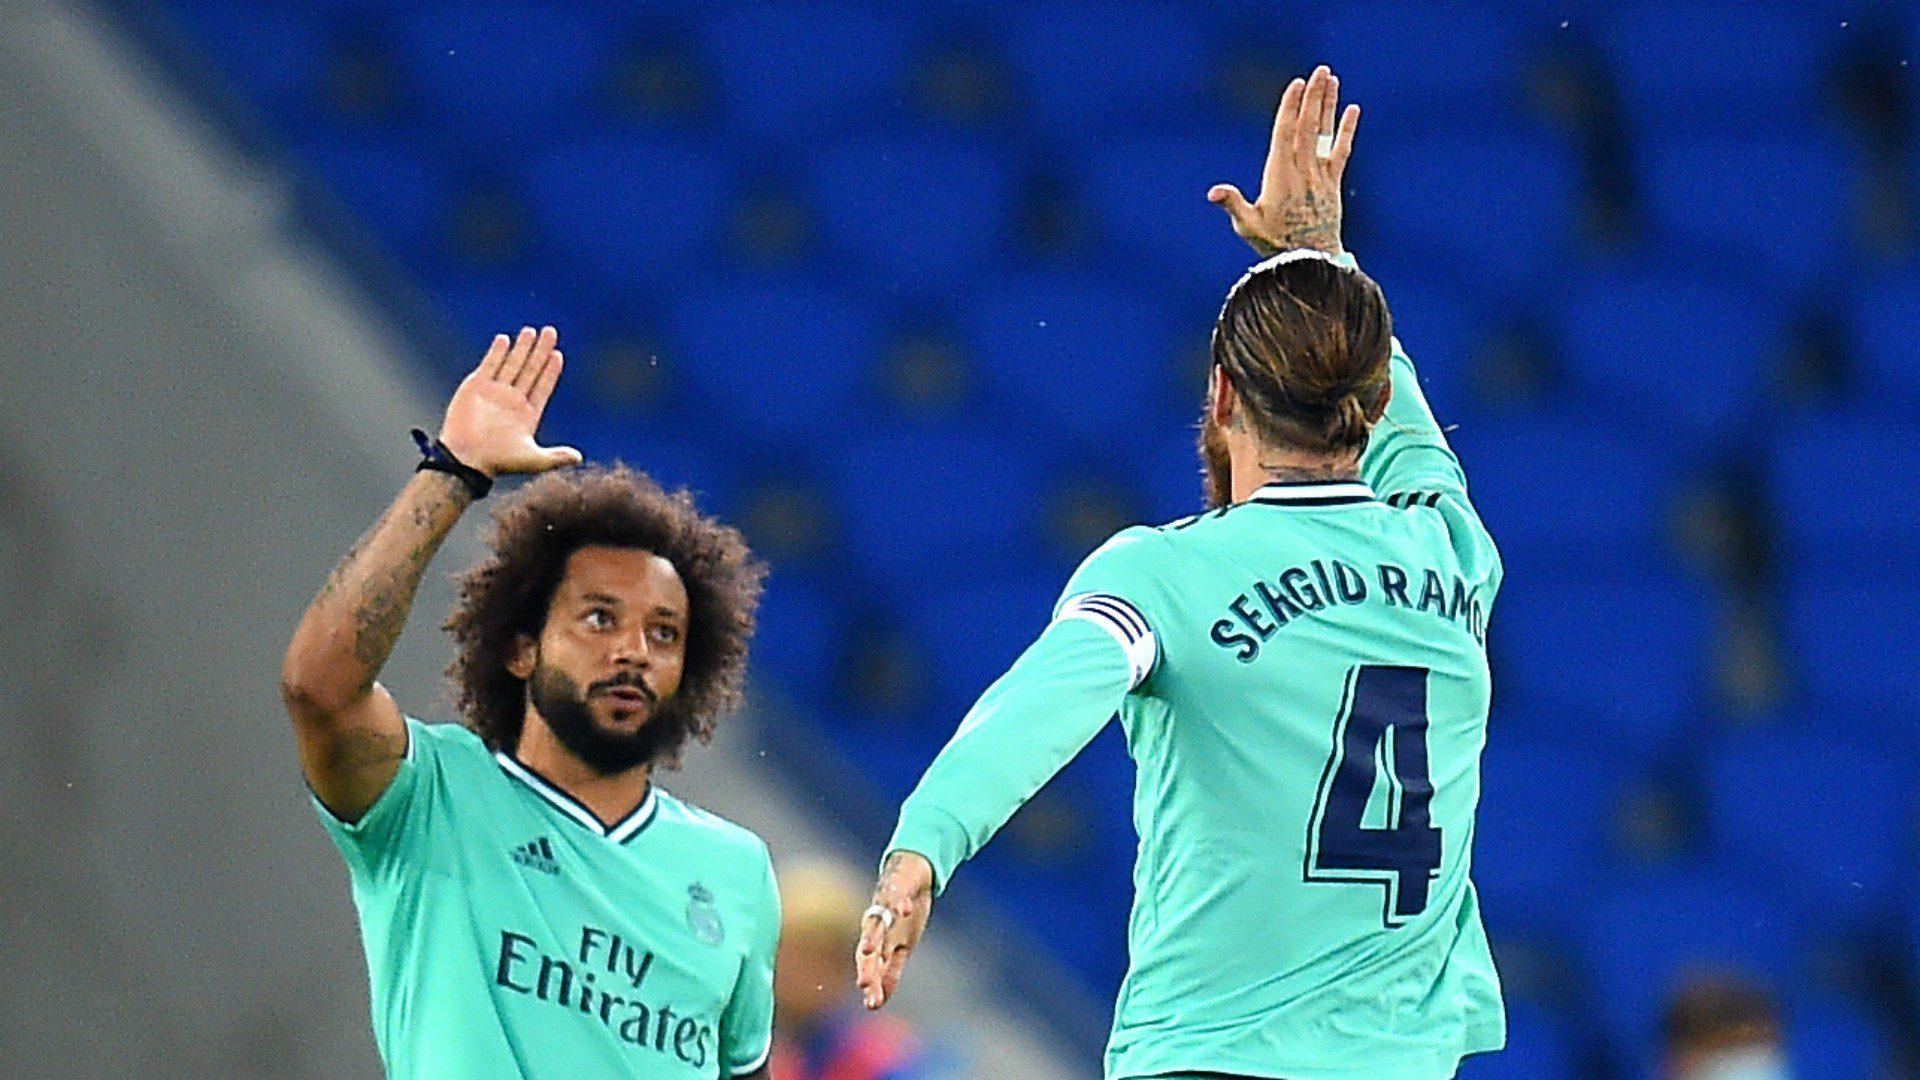 European Football: Messi, 3 Real Madrid captains against Sociedad